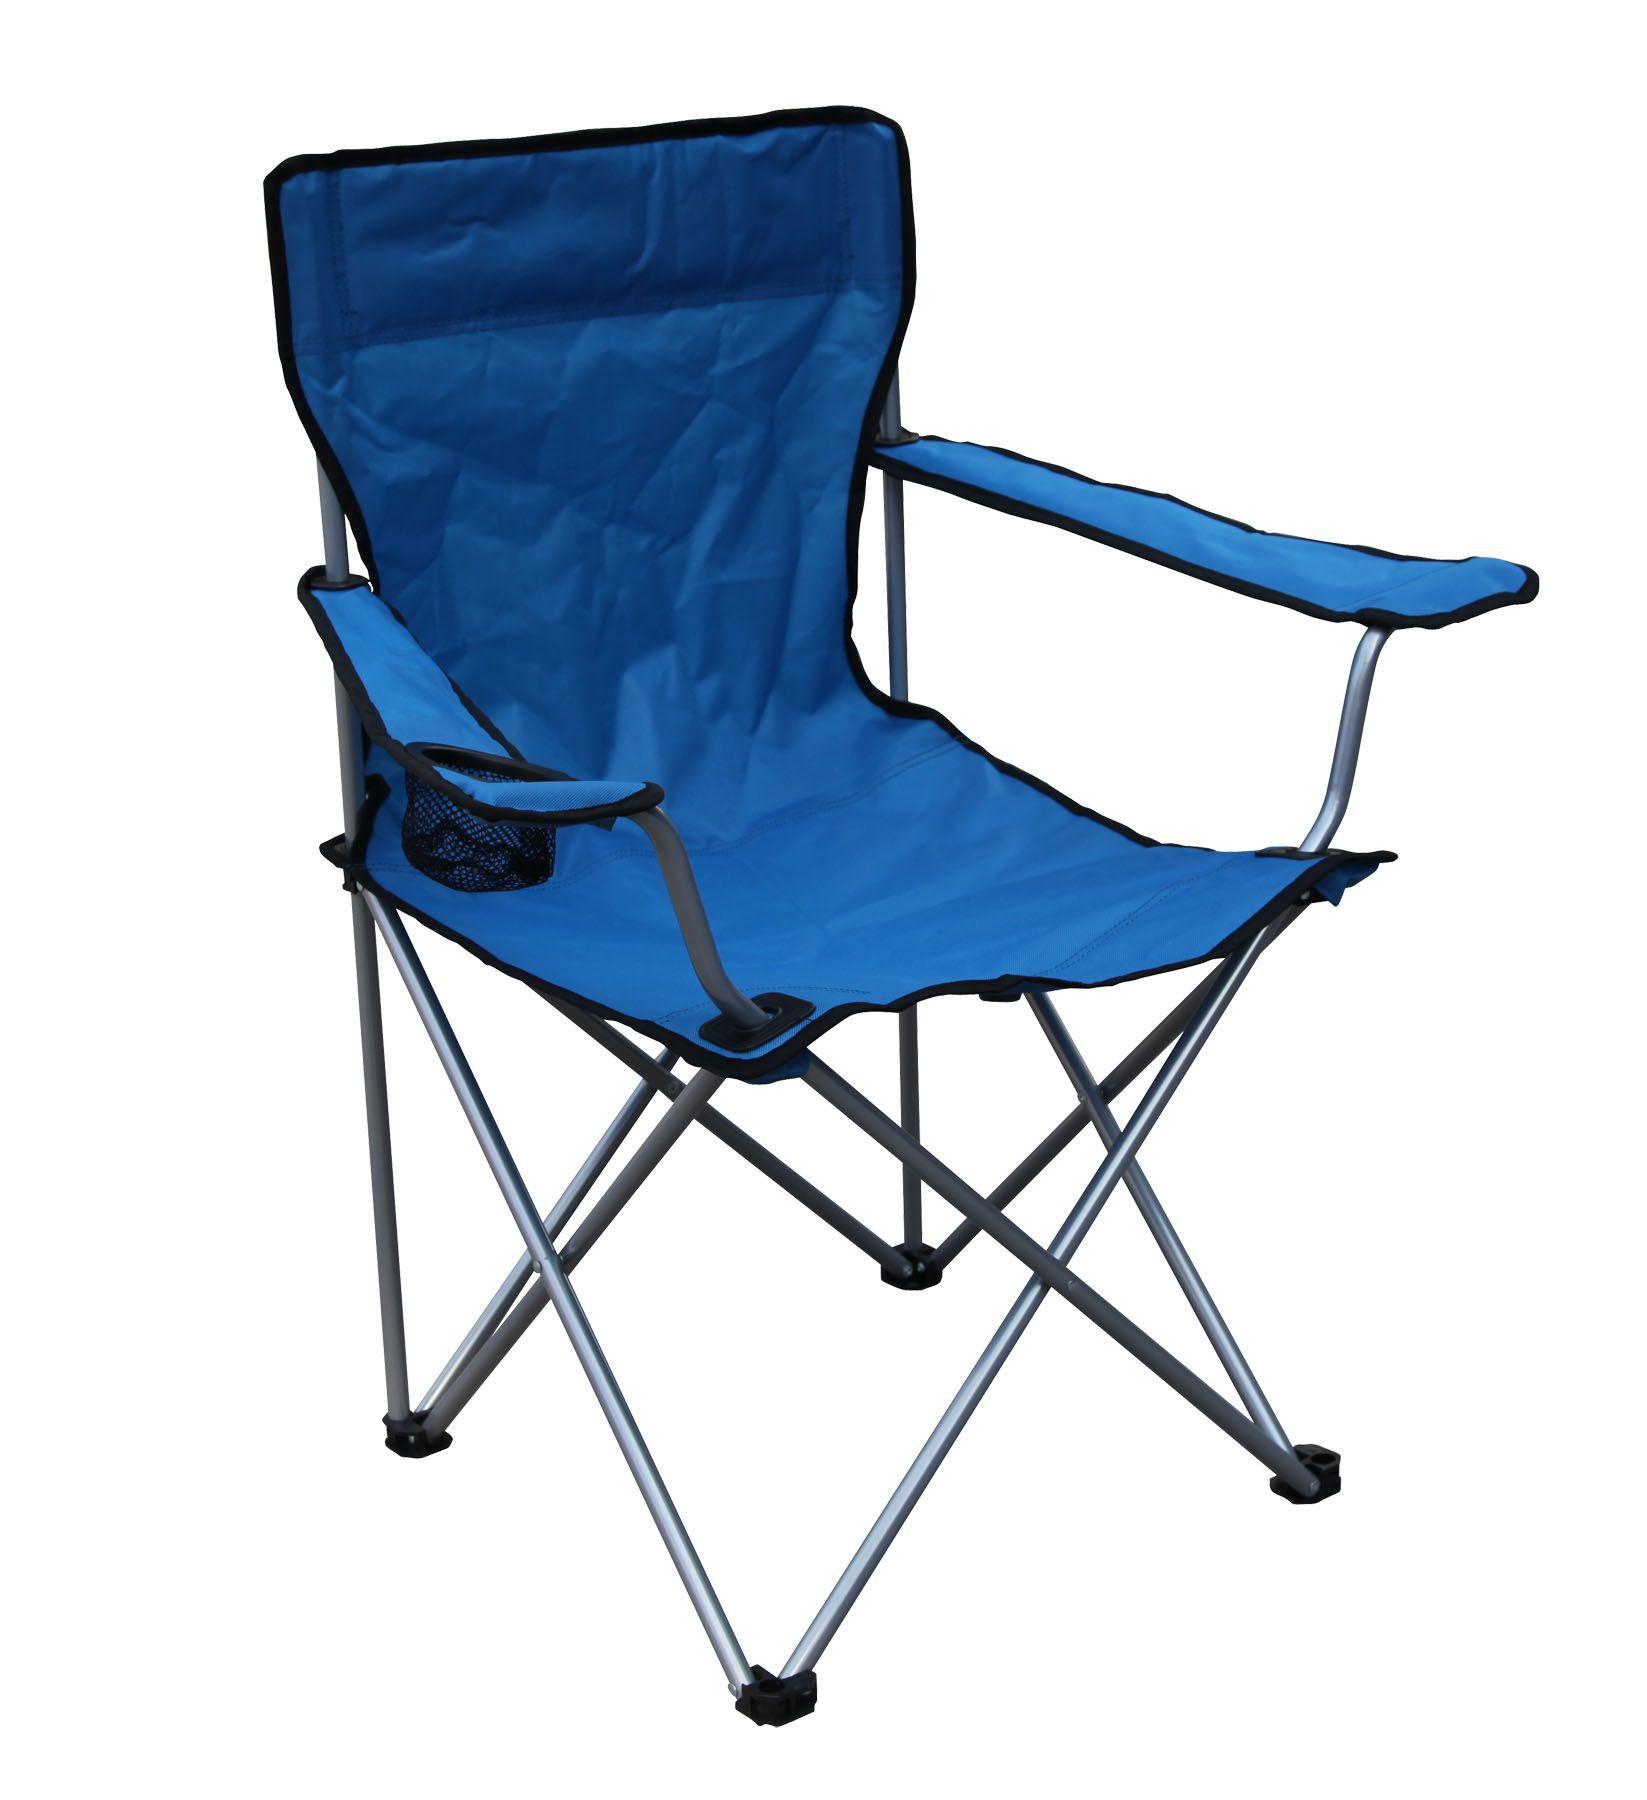 ozark trail oversized mesh chair wooden rocking styles embark upc and barcode upcitemdb